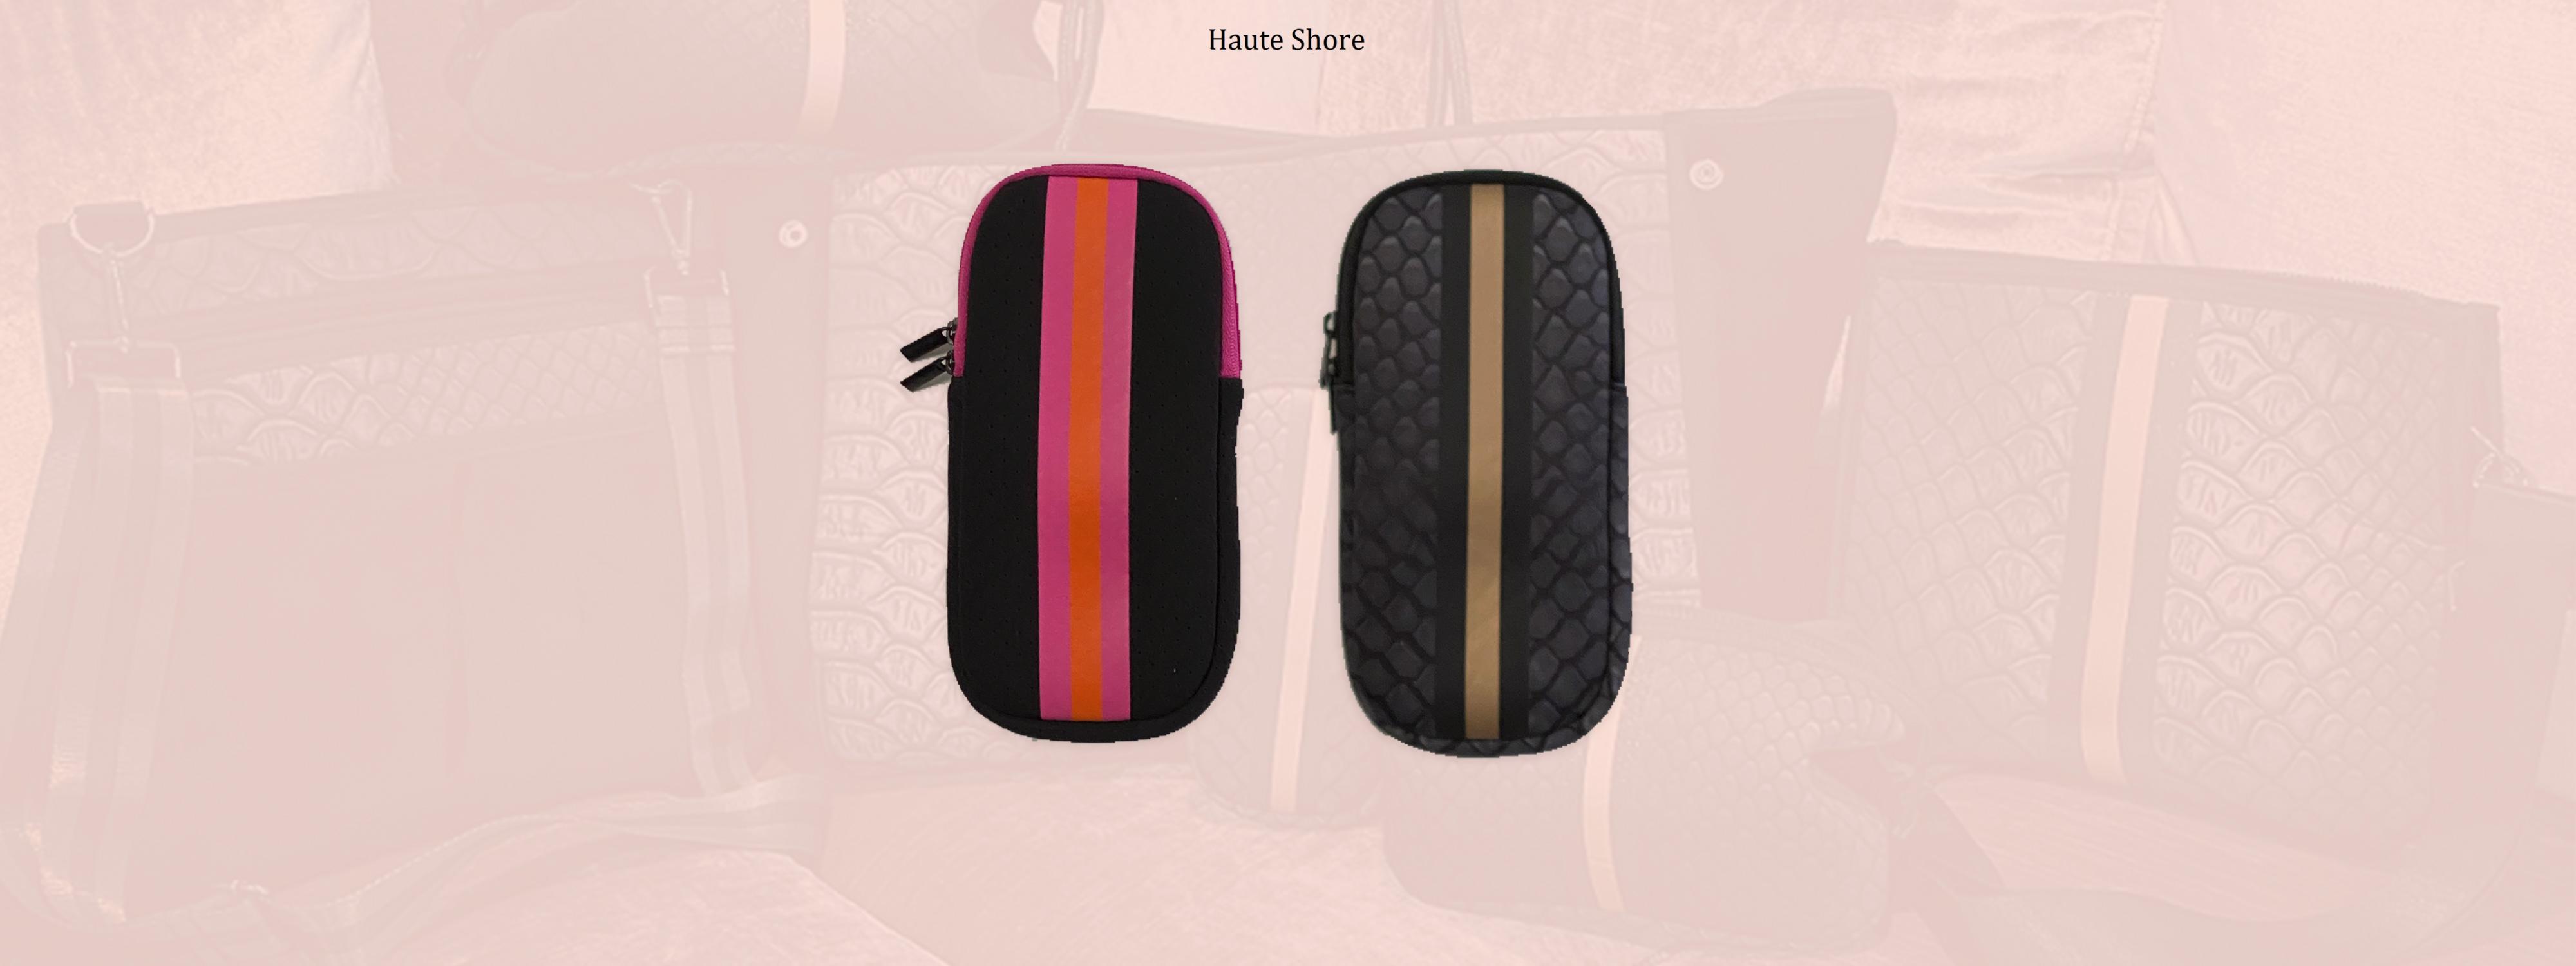 Haute-Shore-Glasses-Cases